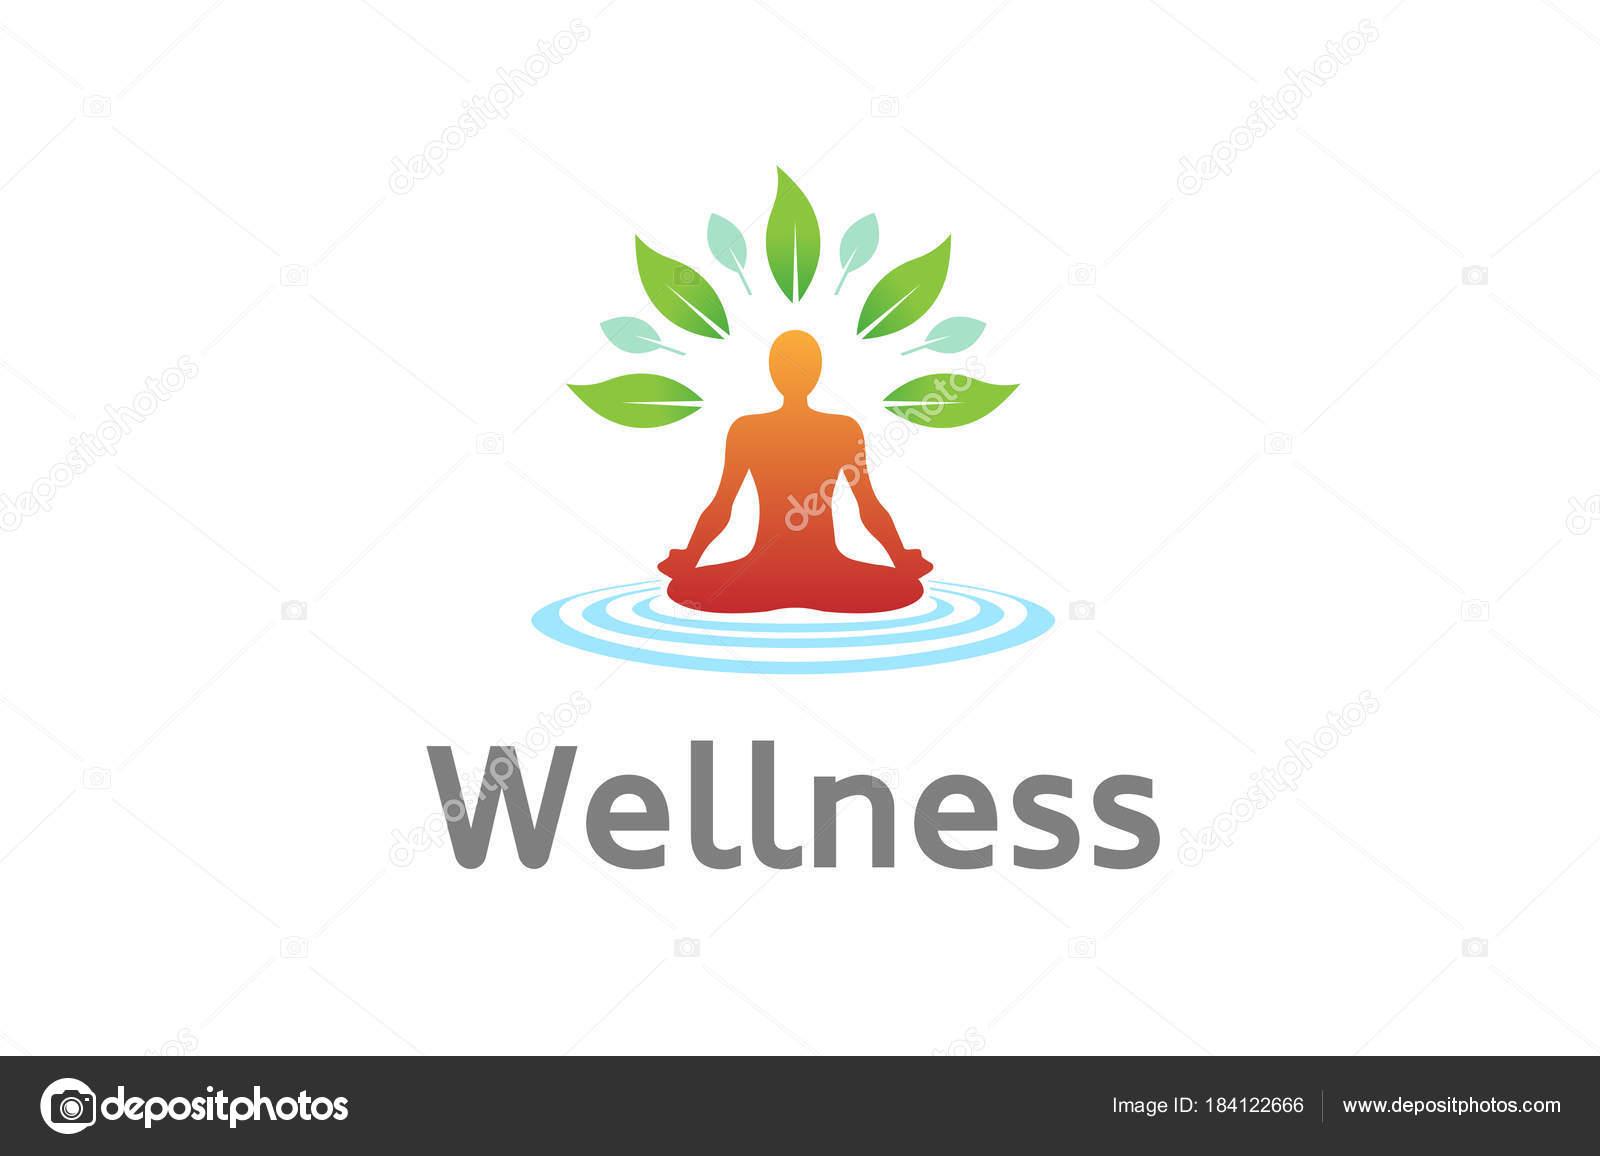 creative body yoga meditation wellness logo design symbol illustration stock vector c guru86 184122666 https depositphotos com 184122666 stock illustration creative body yoga meditation wellness html